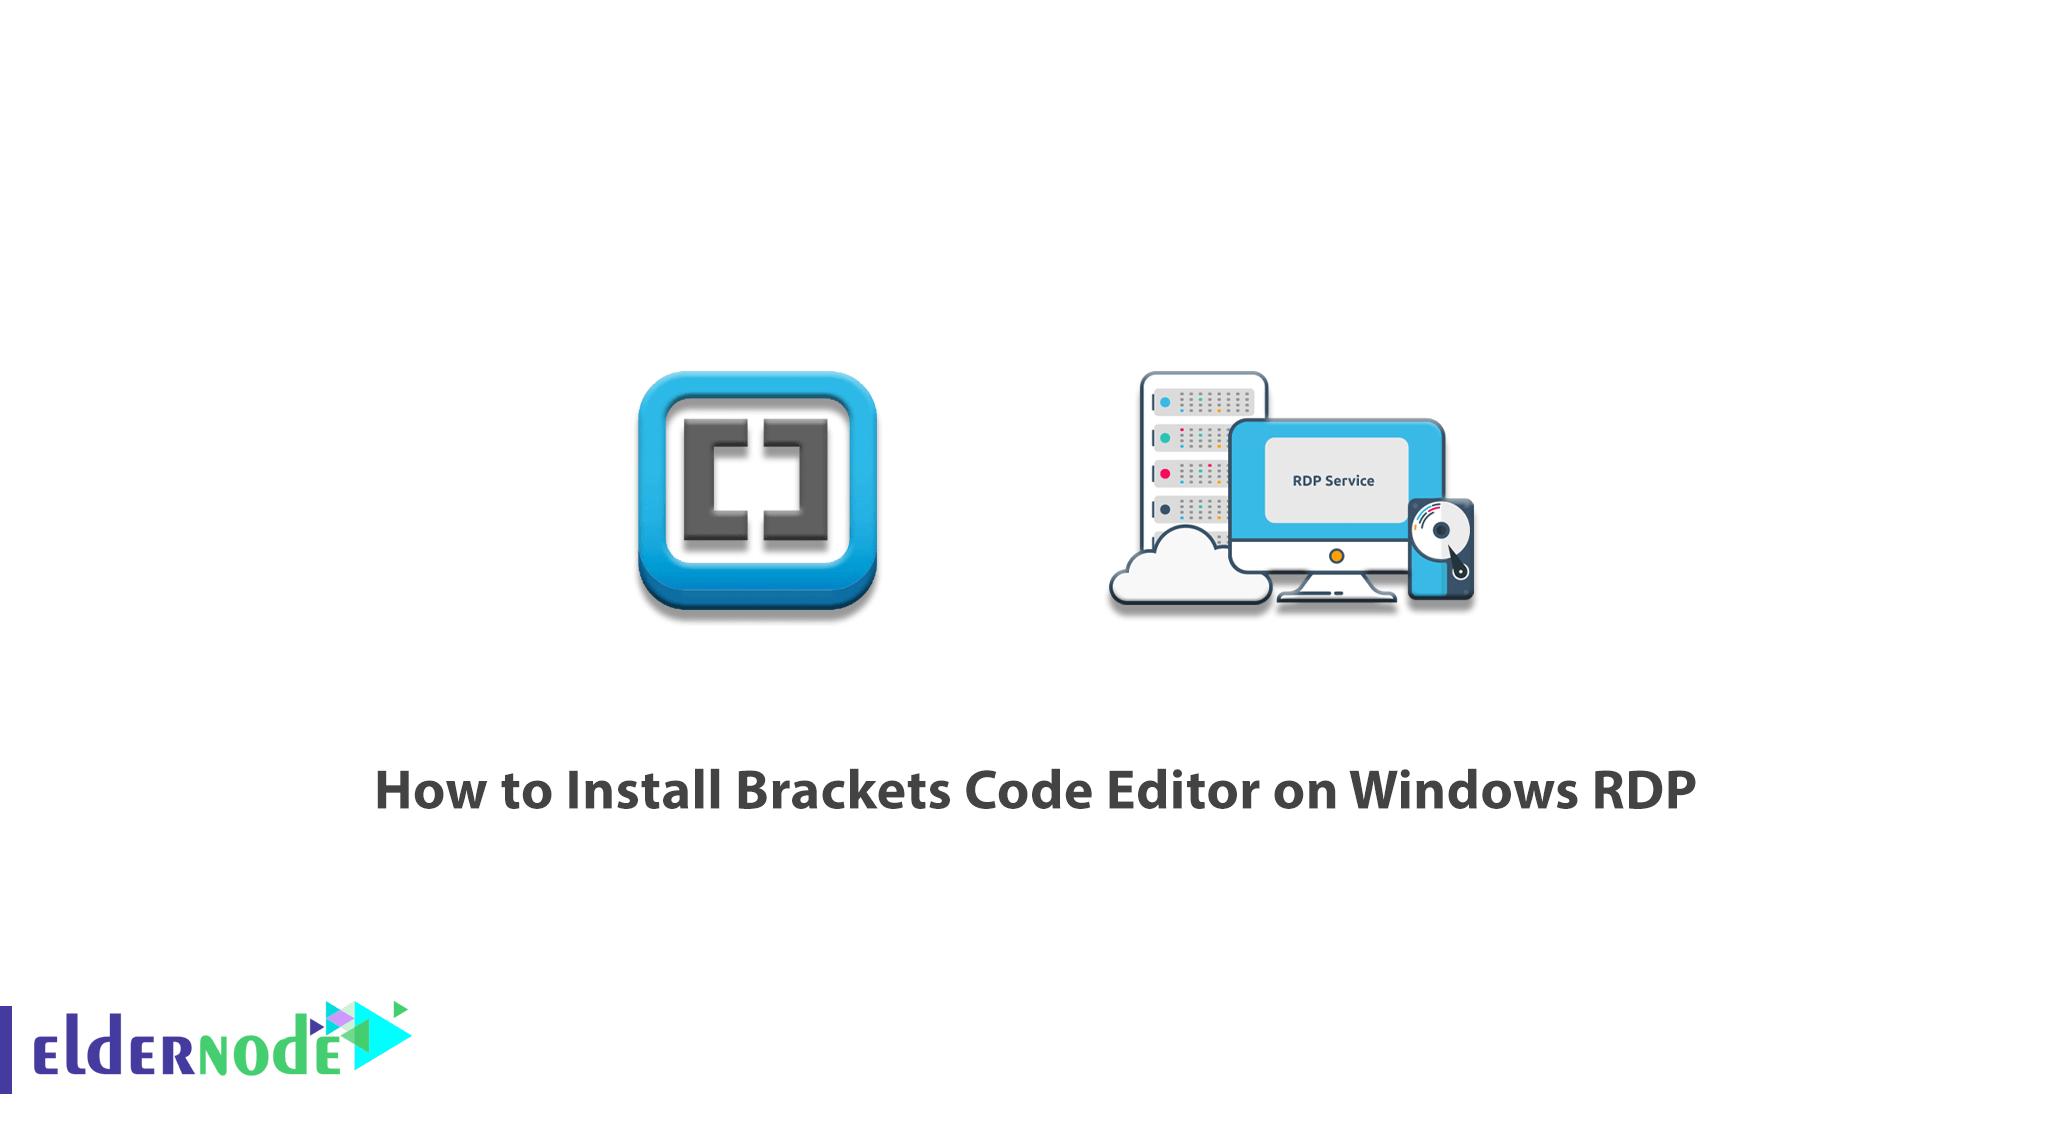 How to Install Brackets Code Editor on Windows RDP